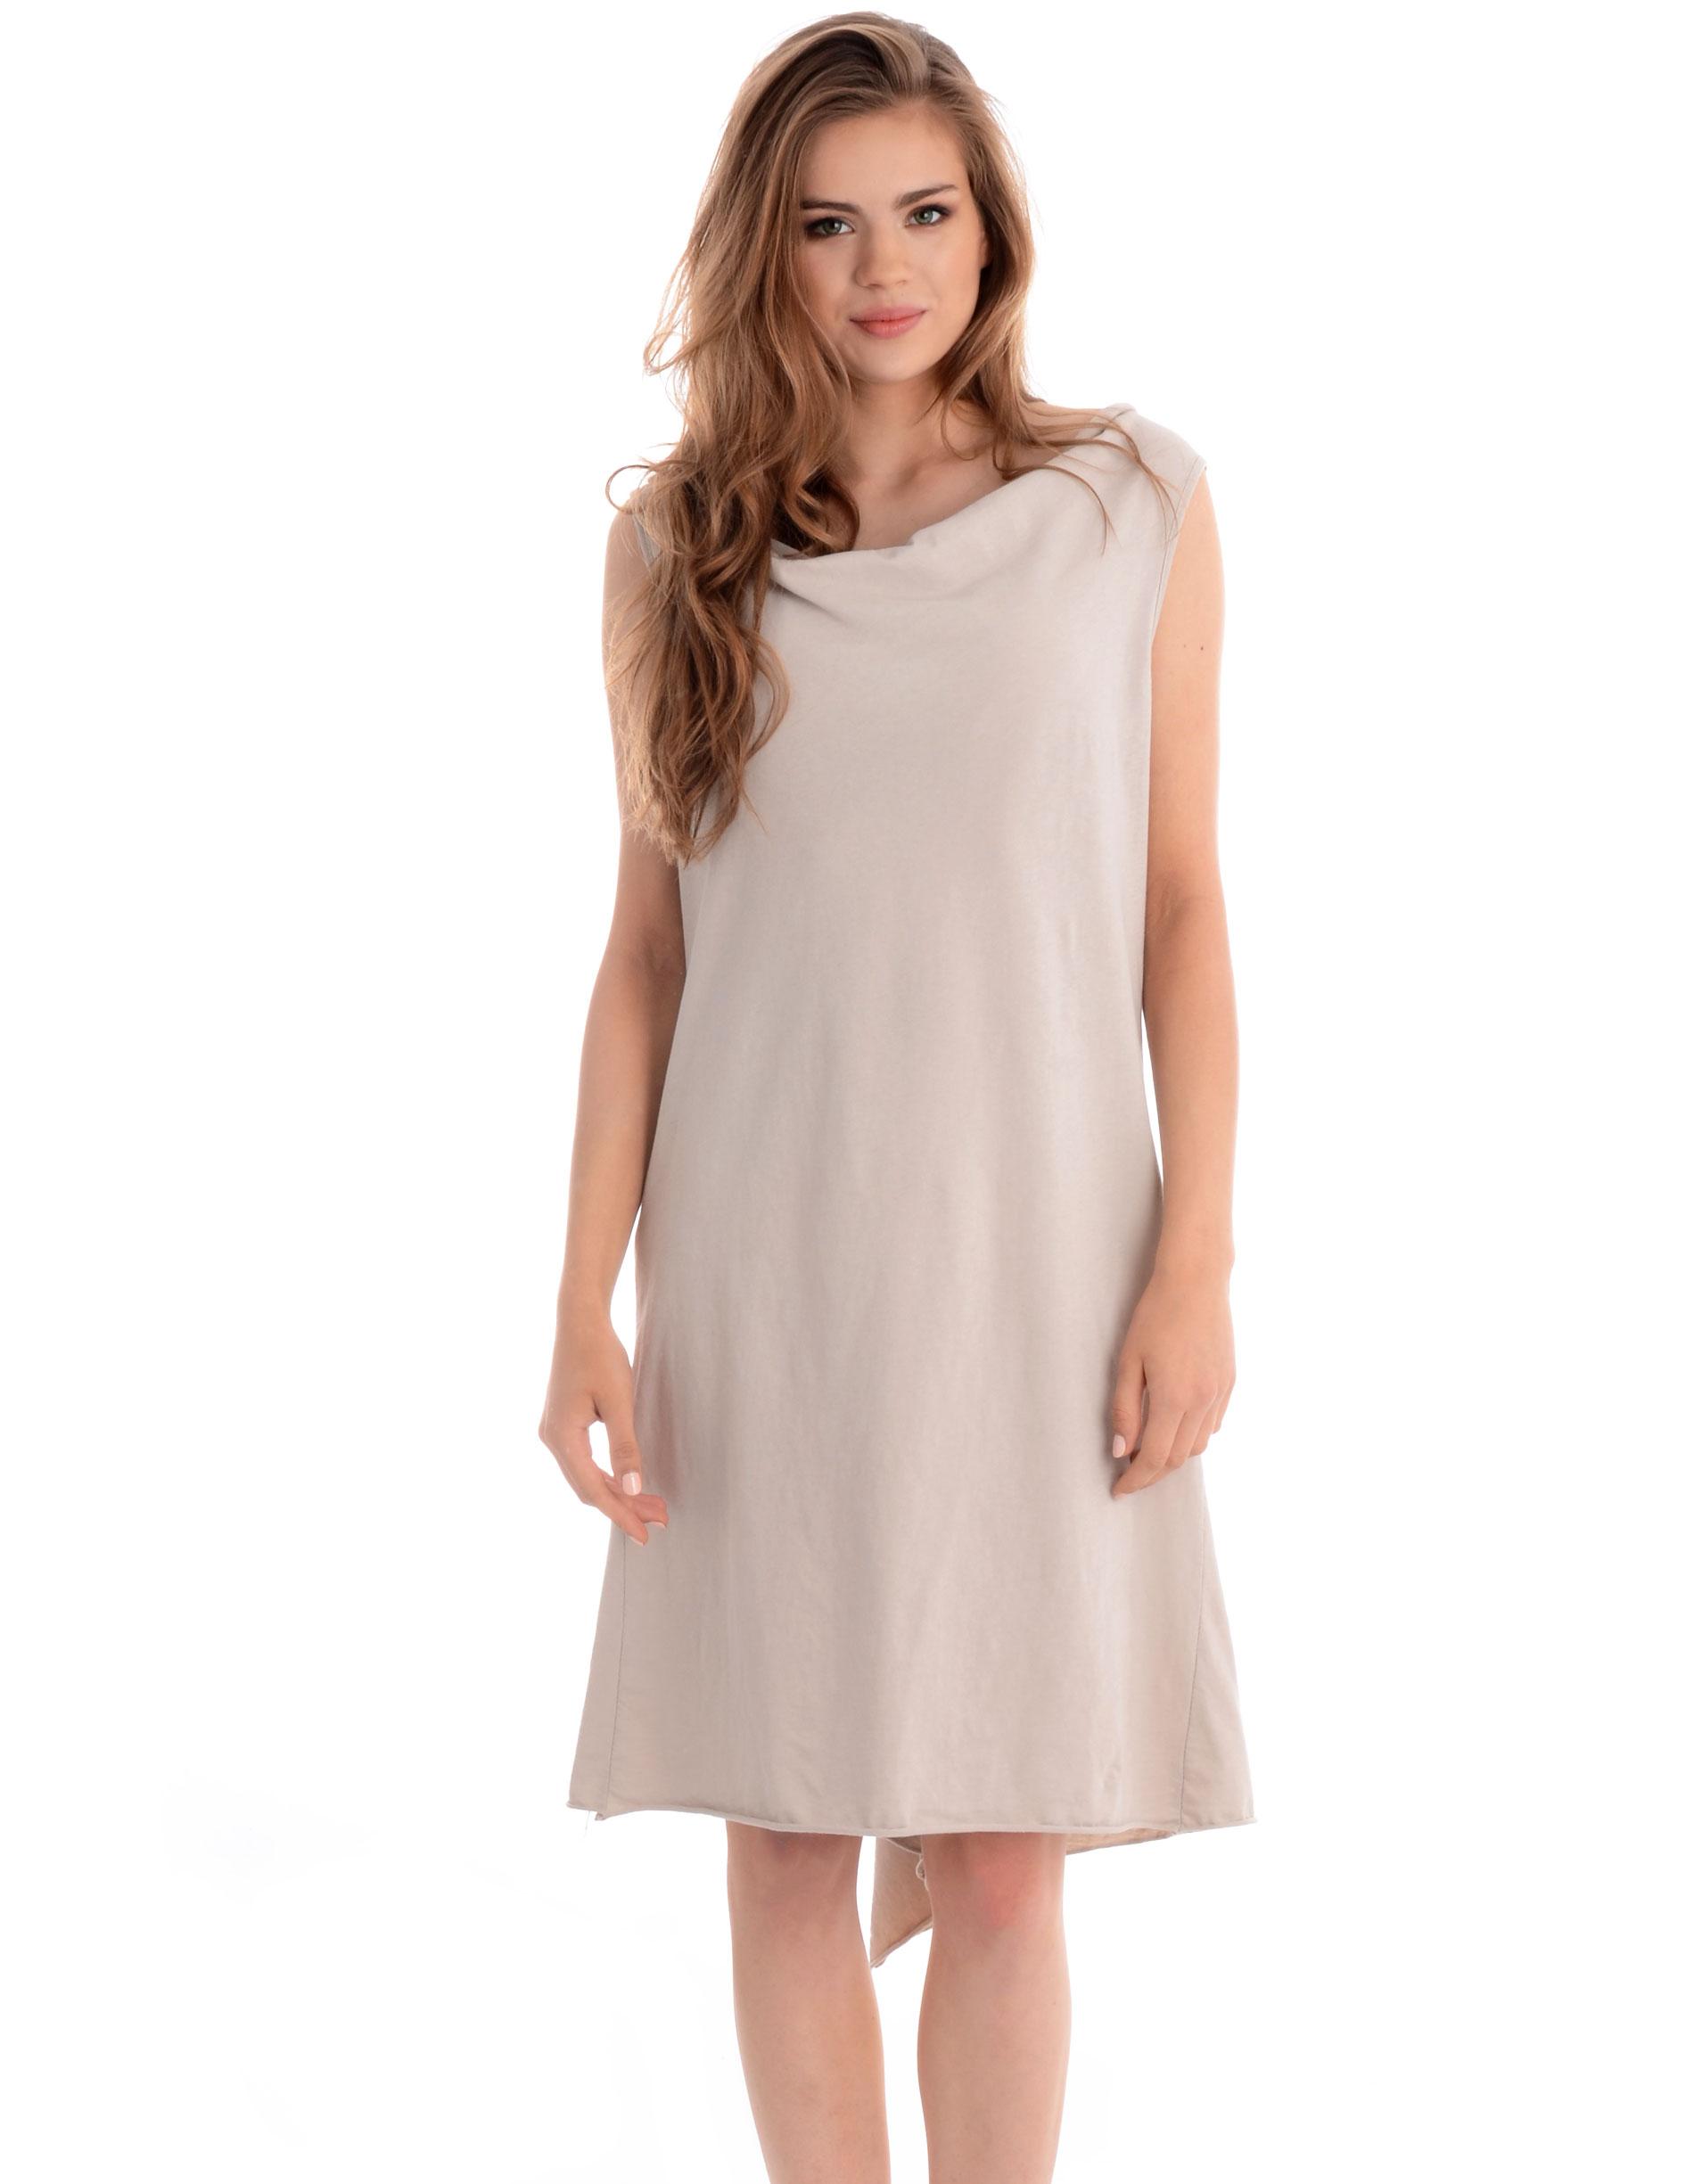 Sukienka - 130-1062 BEIG - Unisono